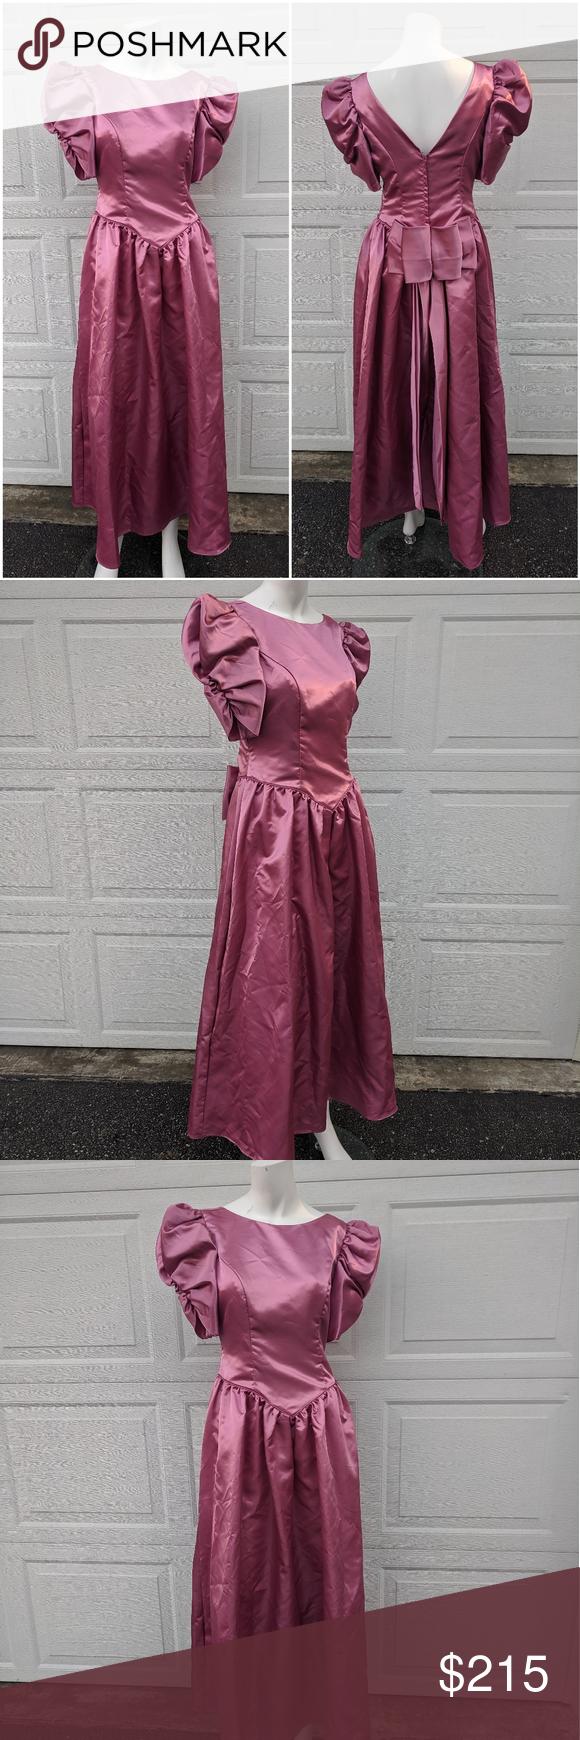 Vintage 1980's High Puff Sleeve Bridesmaids Dress